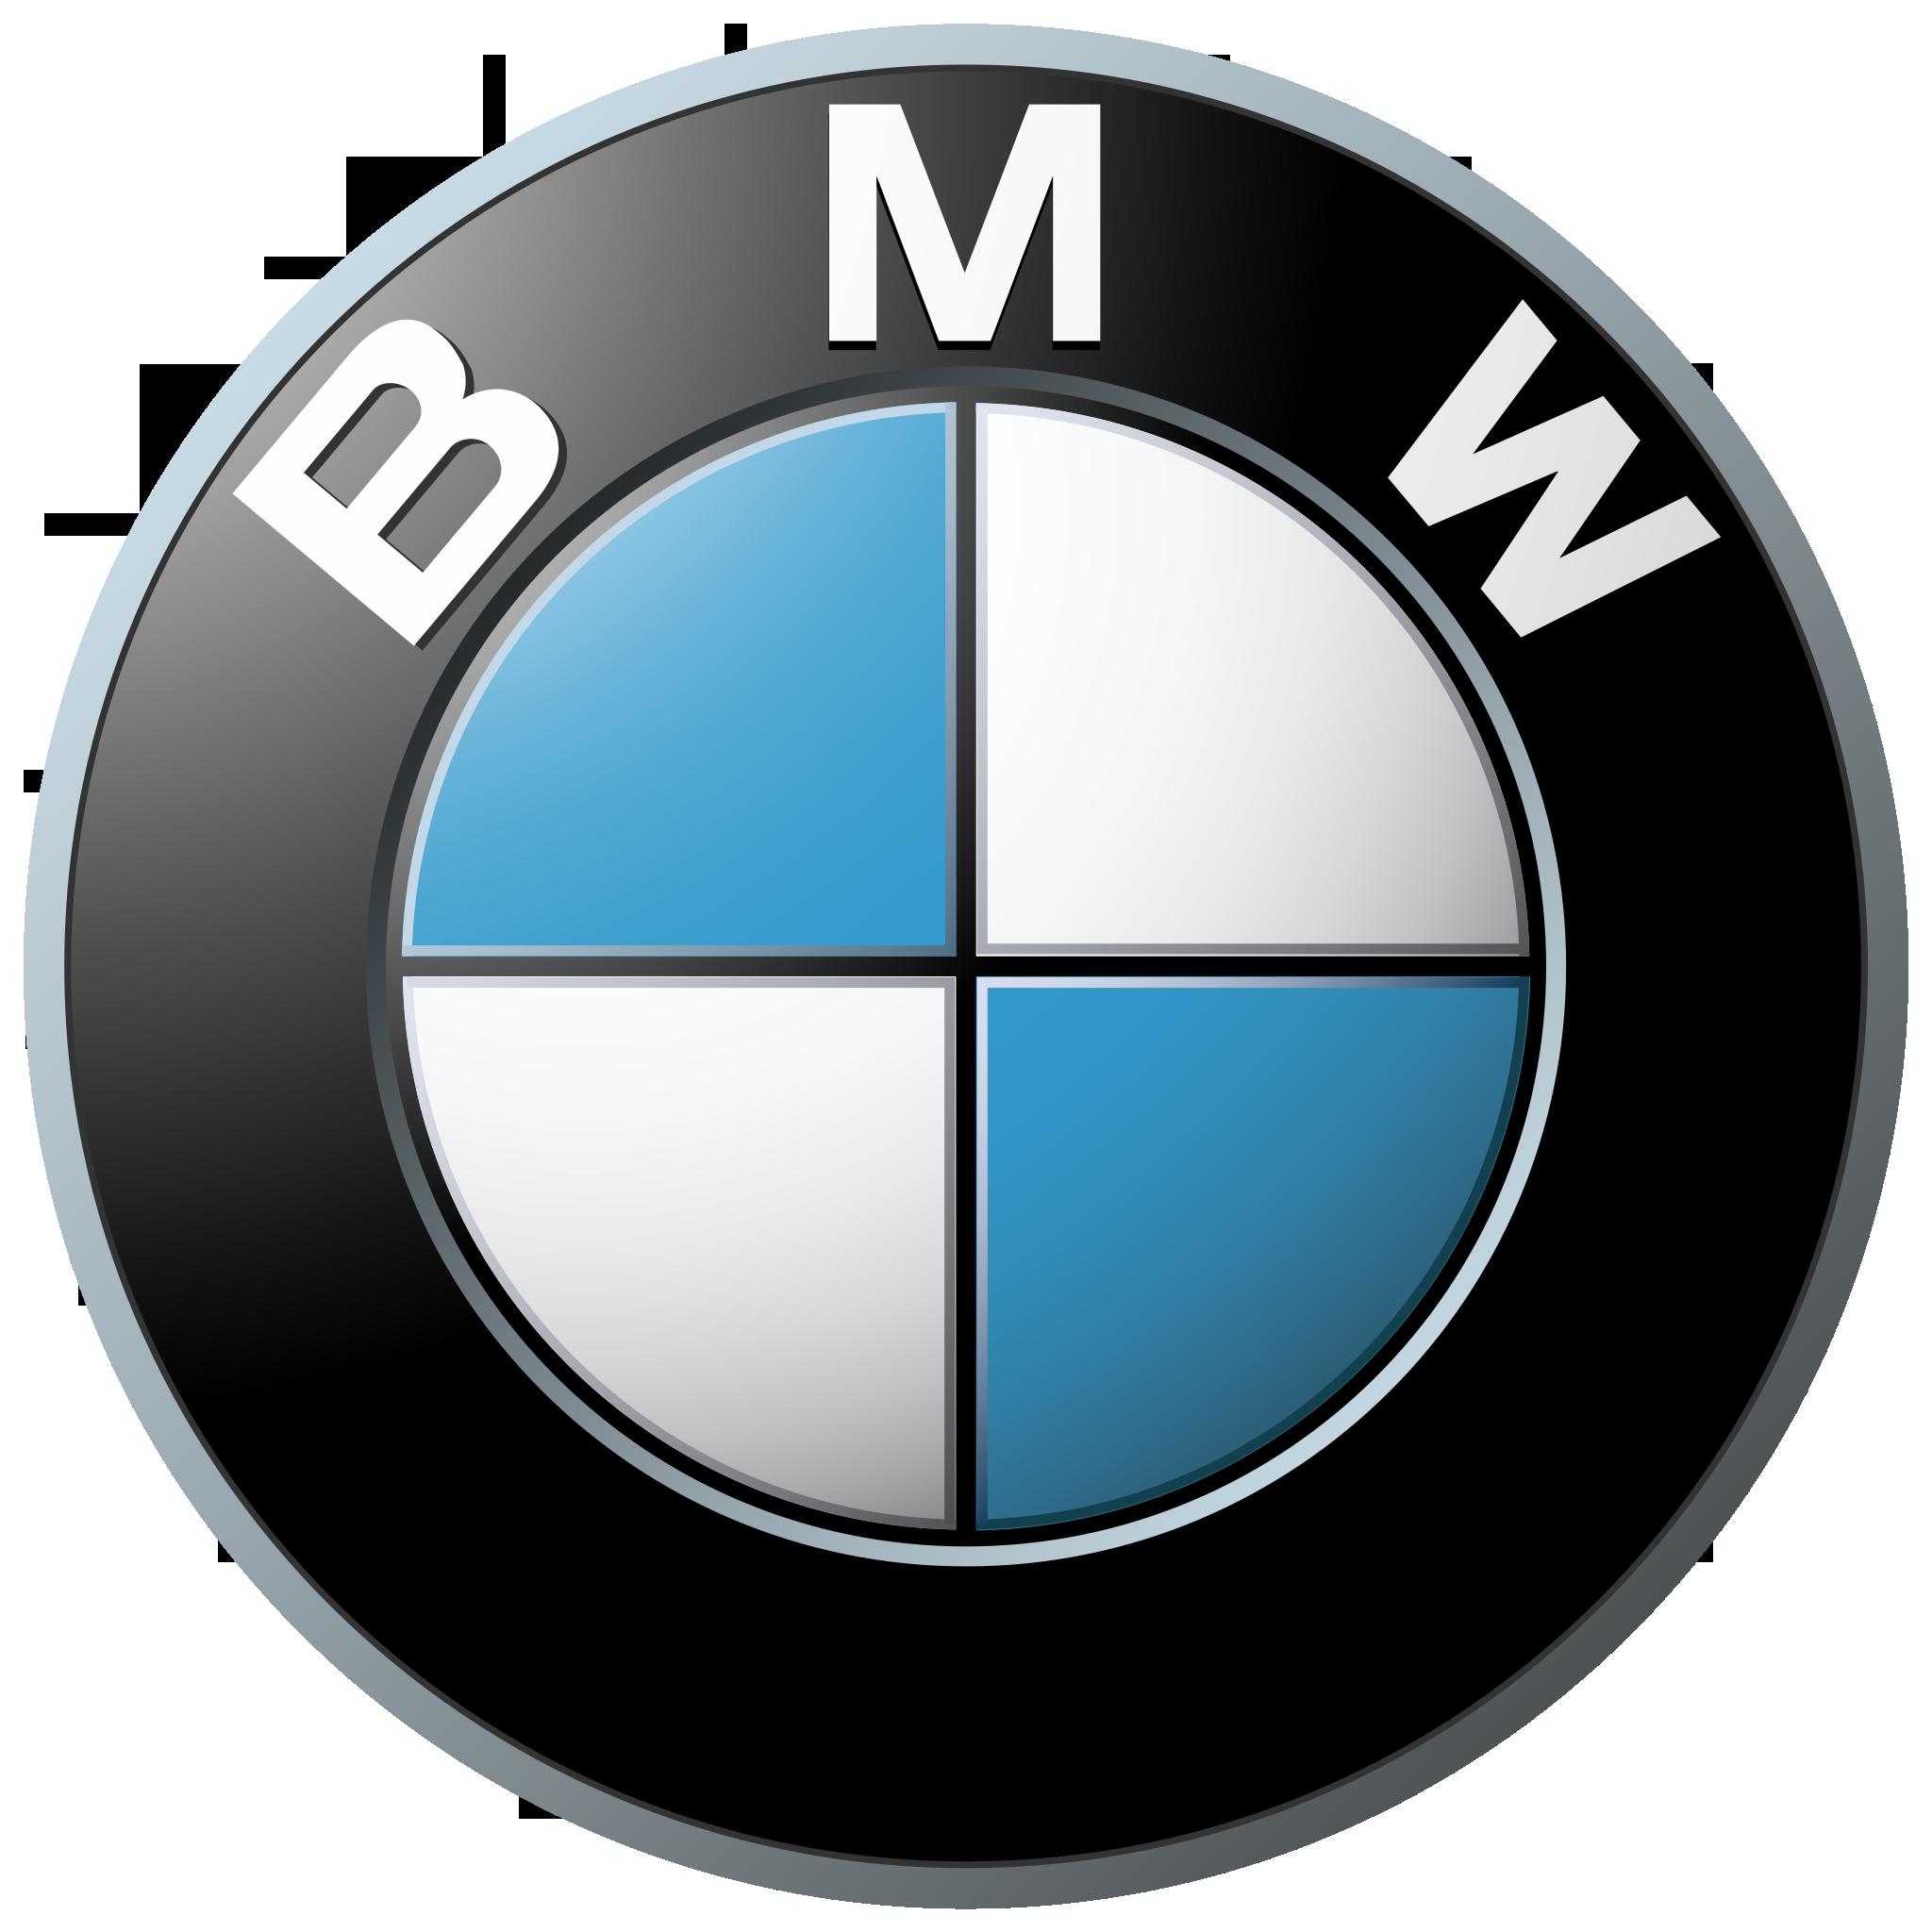 https://jomat.com/wp-content/uploads/2018/10/BMW-logo-2000-2048x2048.png